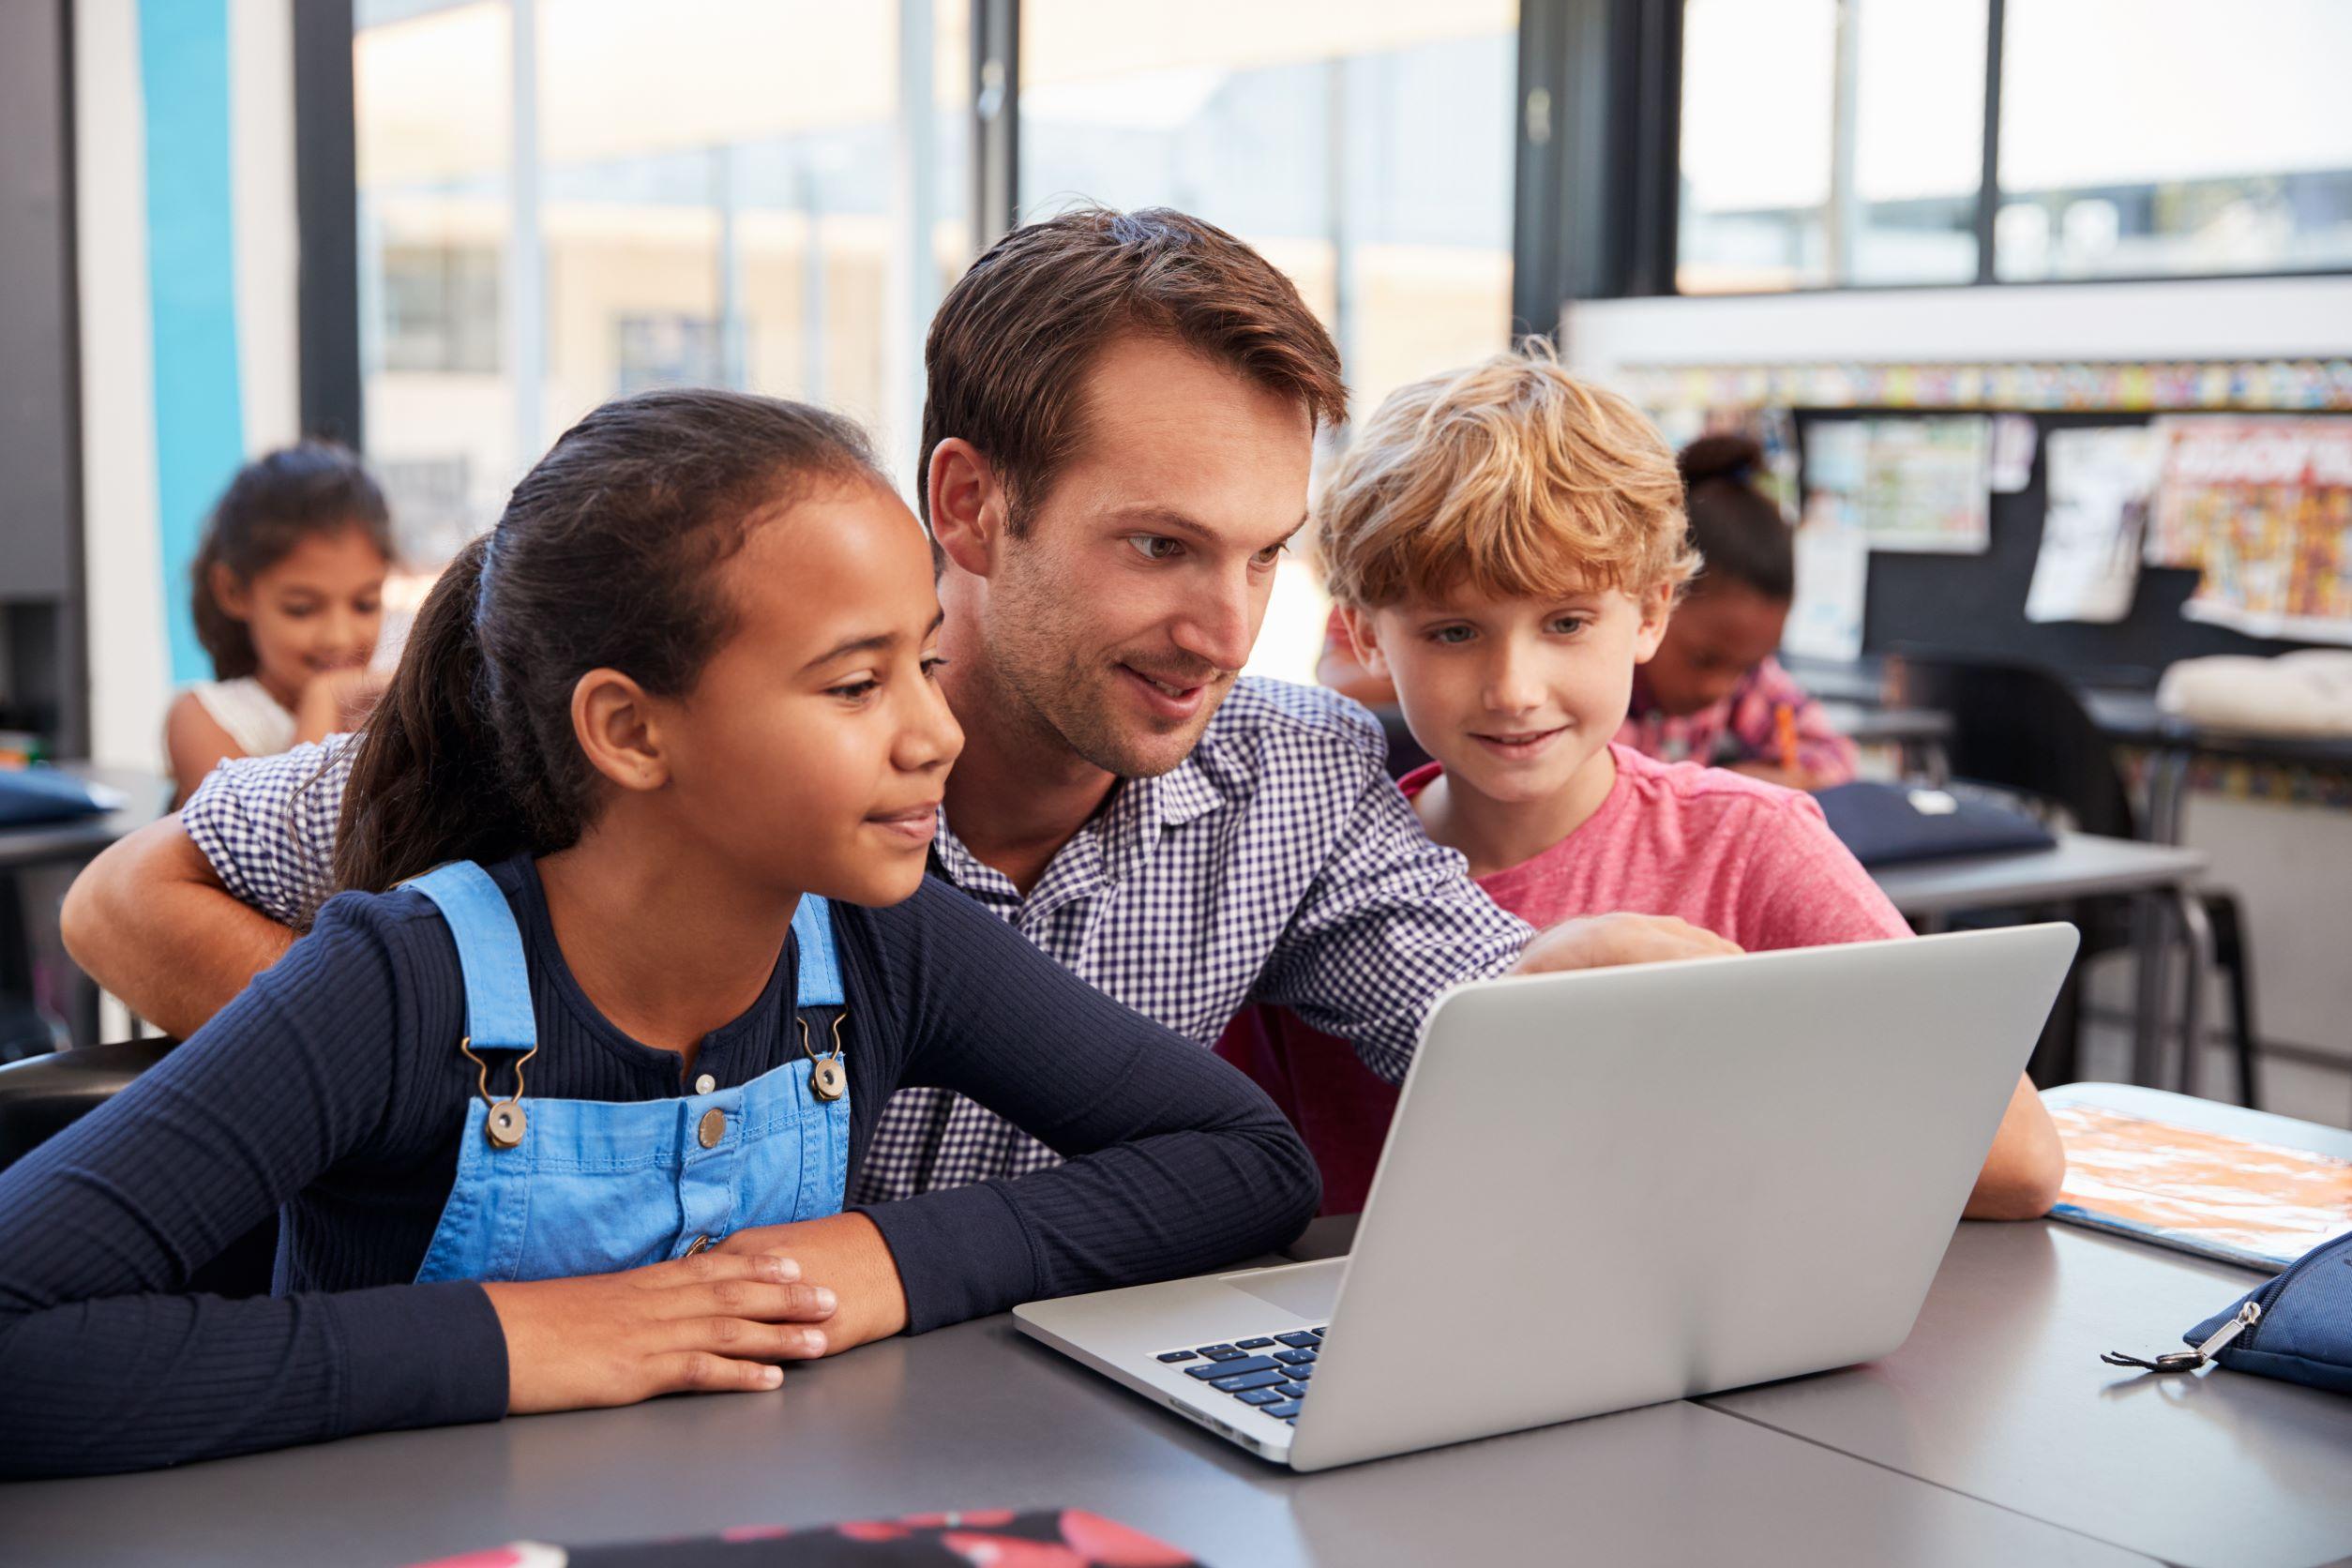 Computer science education in Arkansas